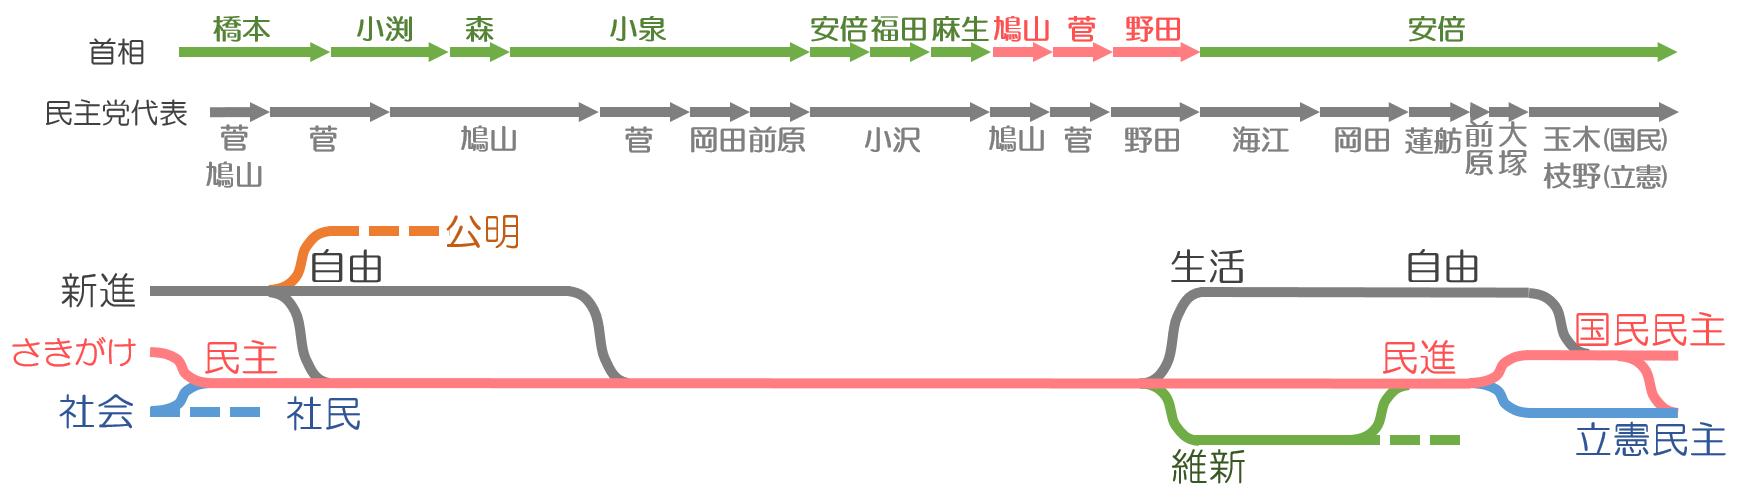 f:id:Yashio:20200831225253p:image:w500